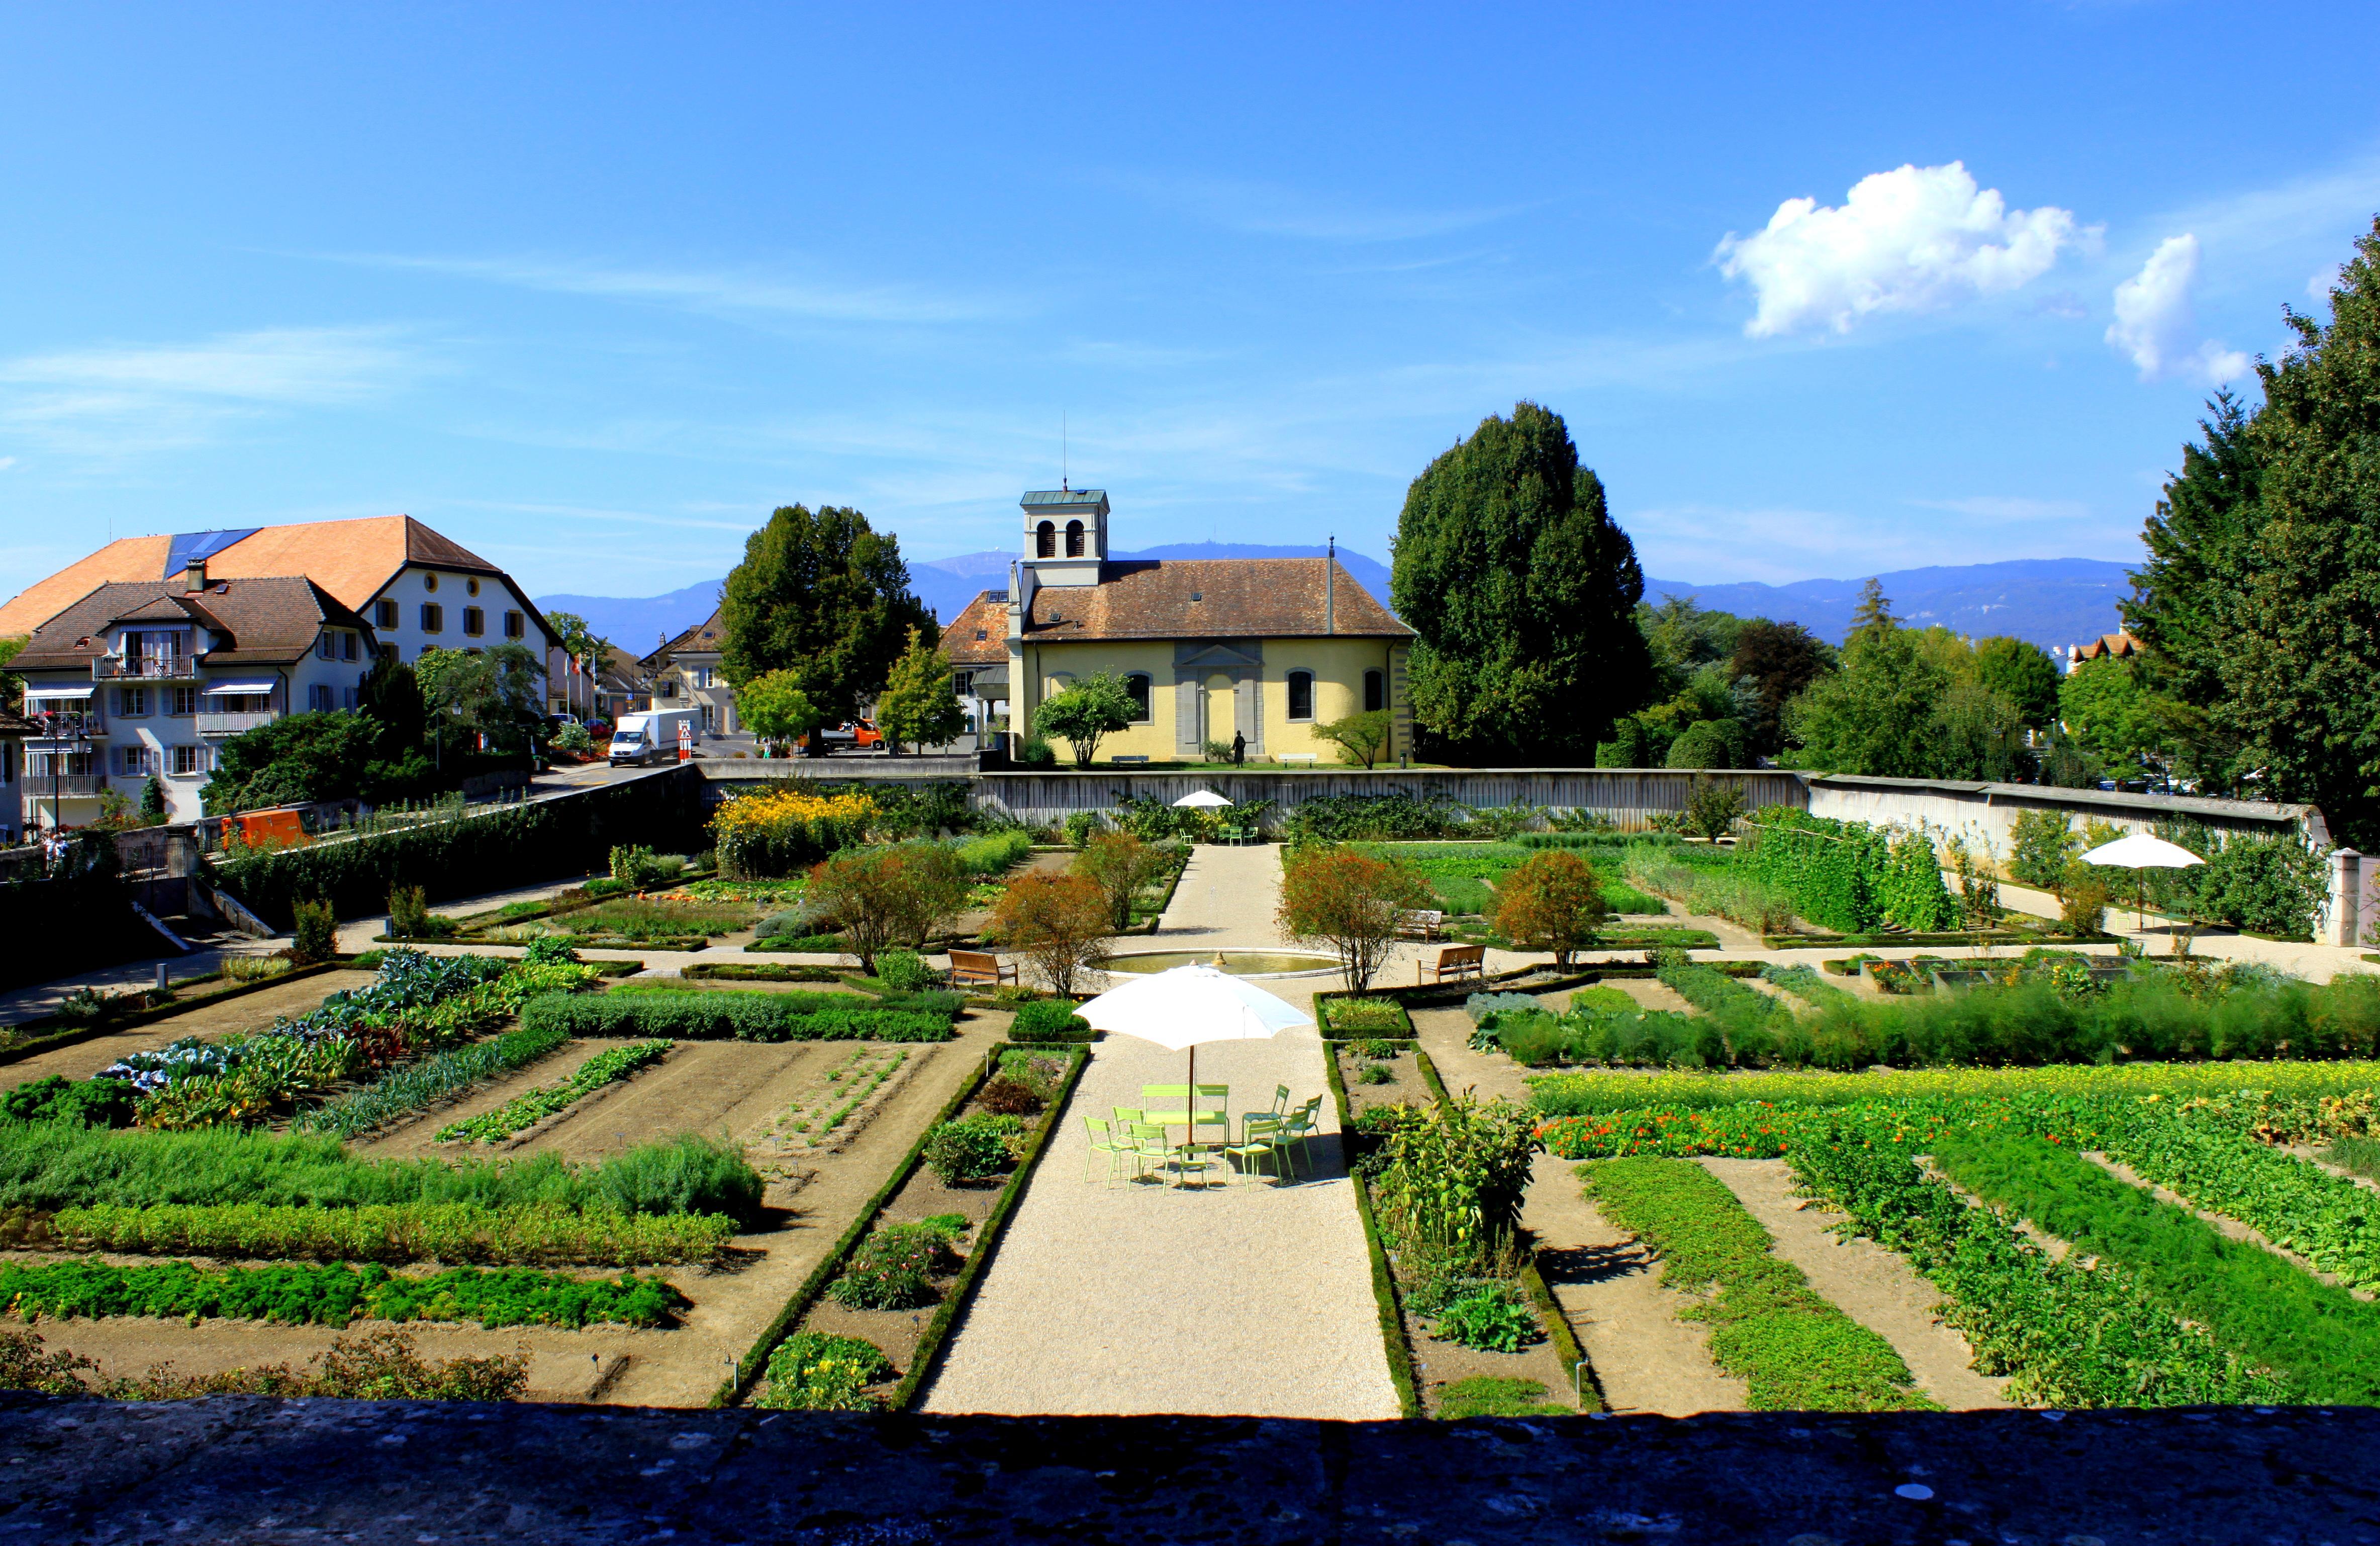 File:Château de Prangins 5.jpg - Wikimedia Commons